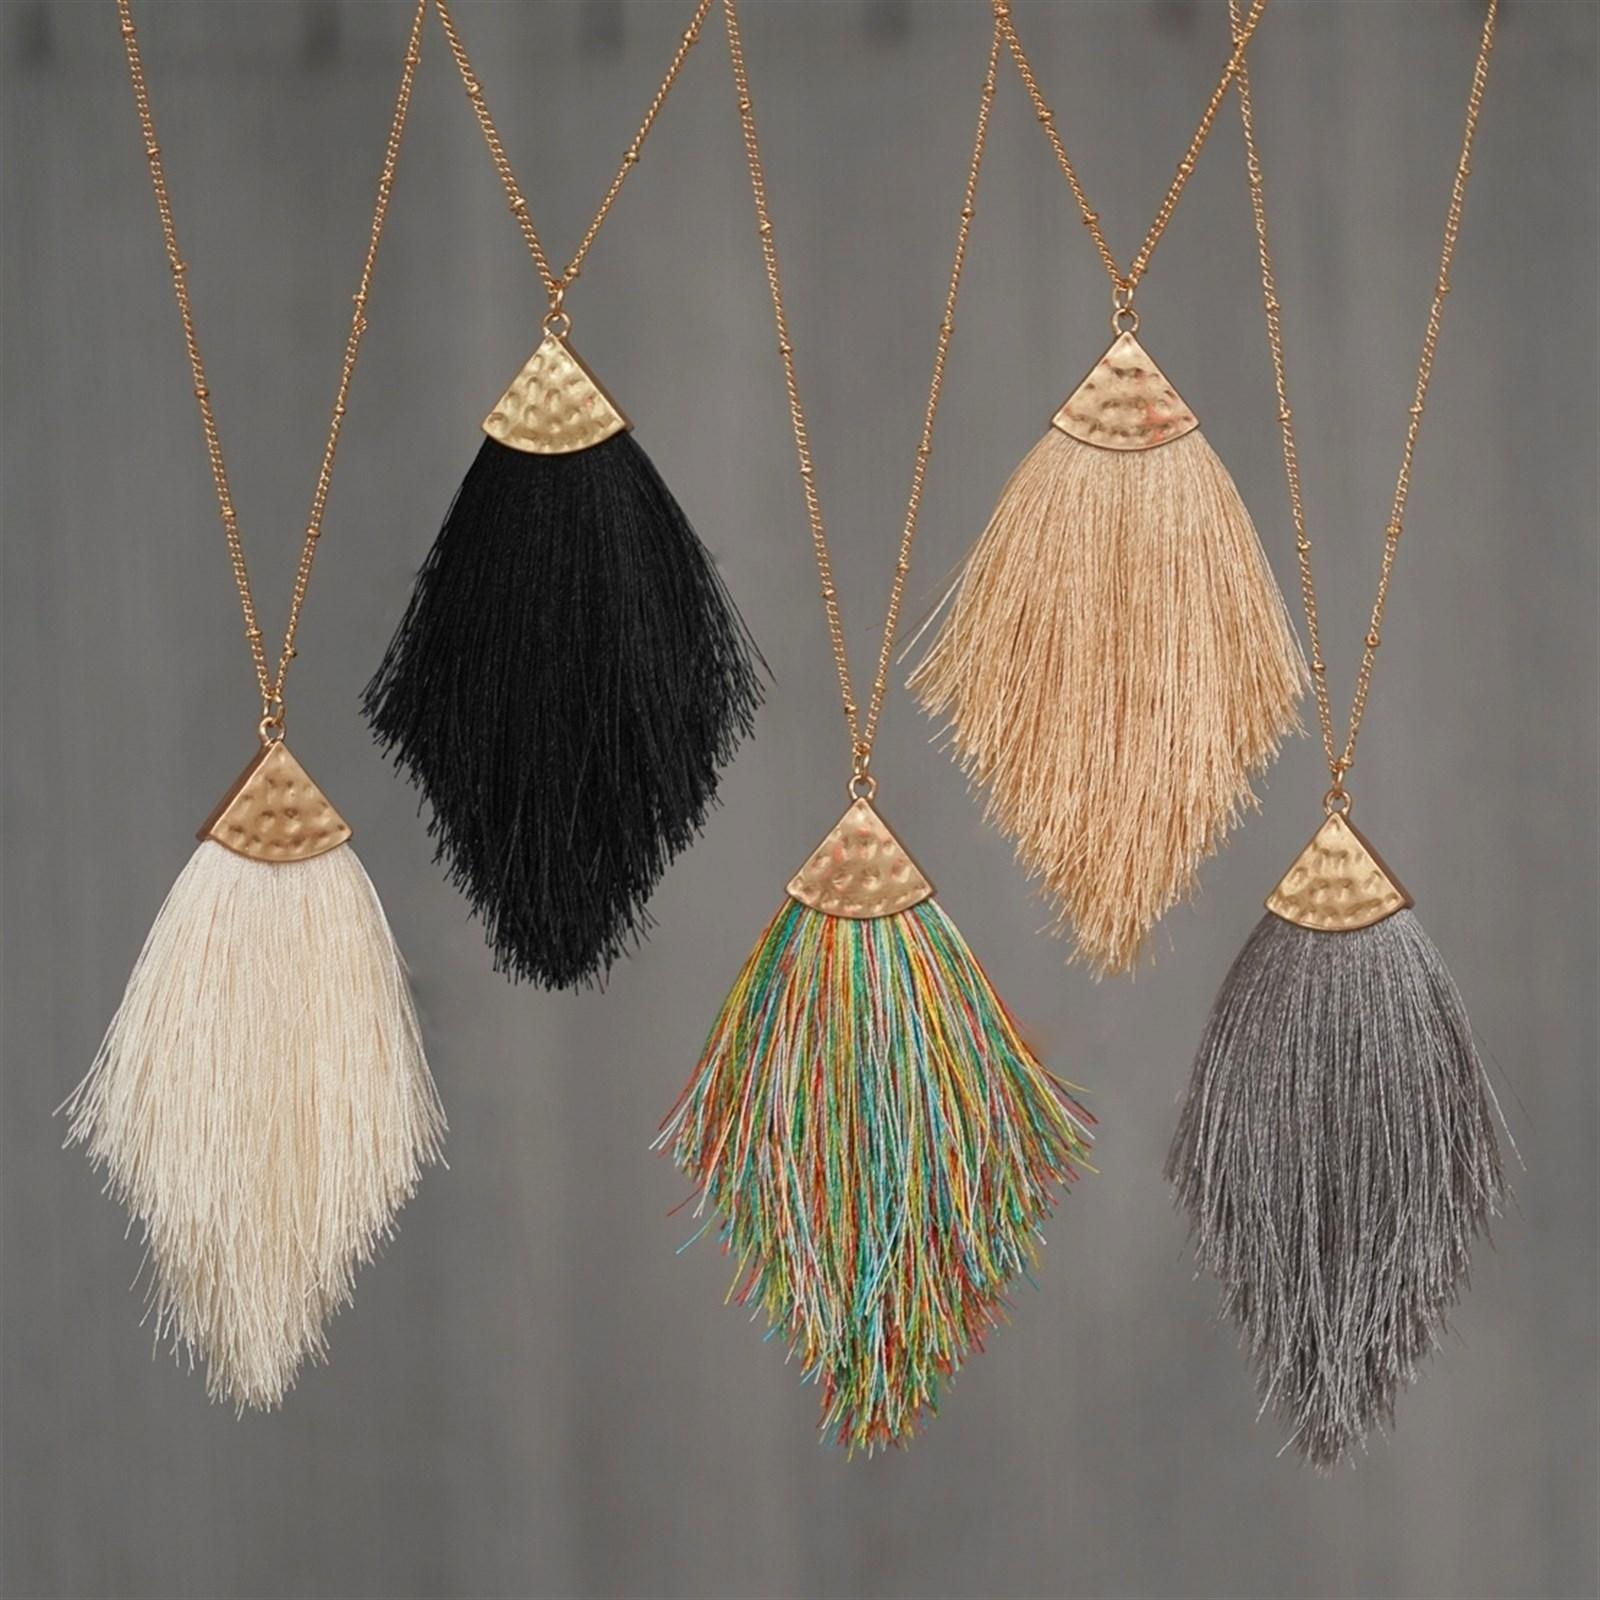 Soft Tassel Necklaces